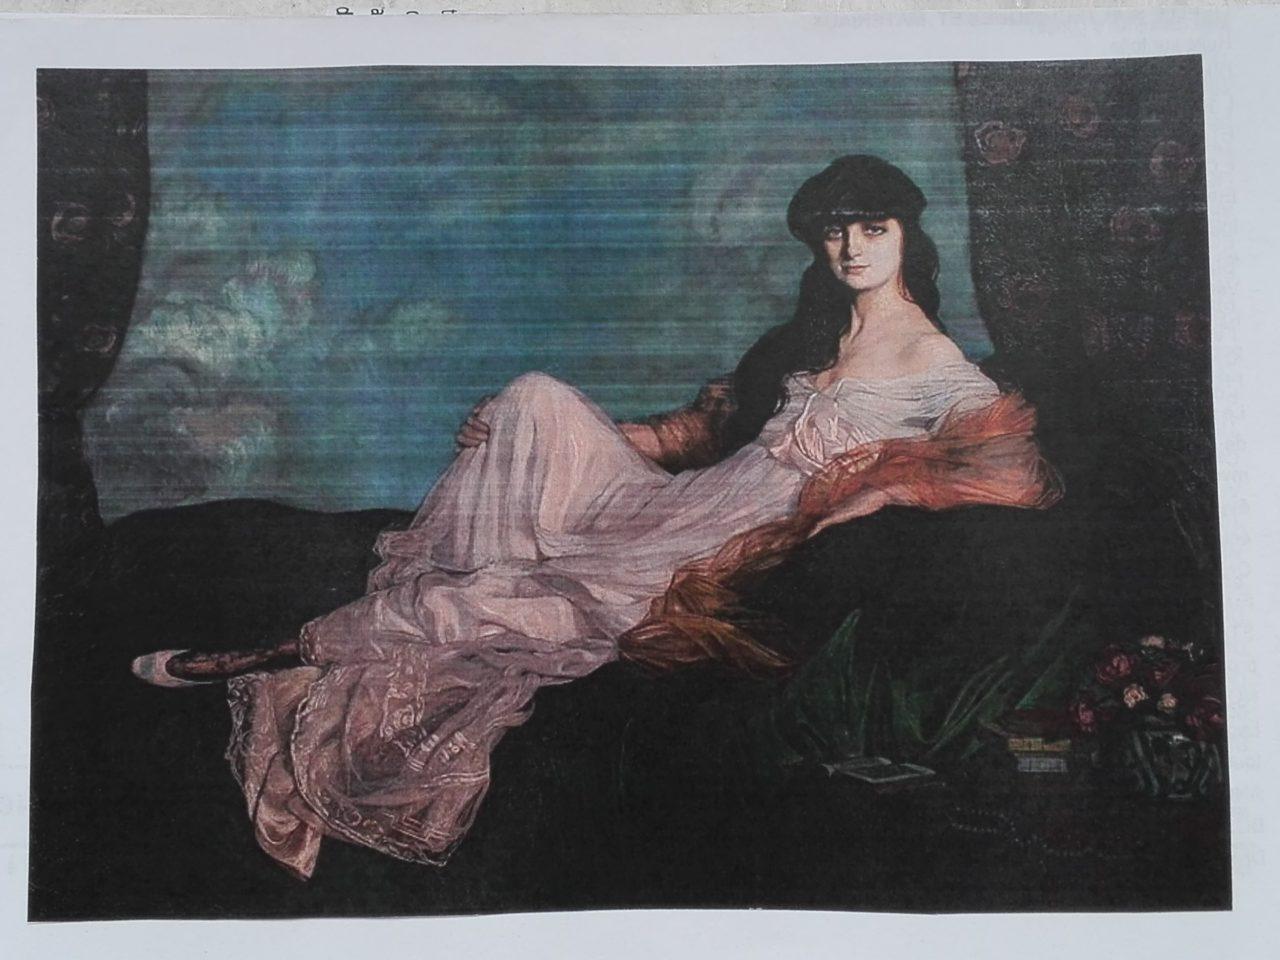 Ignacio Zuloaga Portrait de la comtesse Mathieu de Noailles 1913